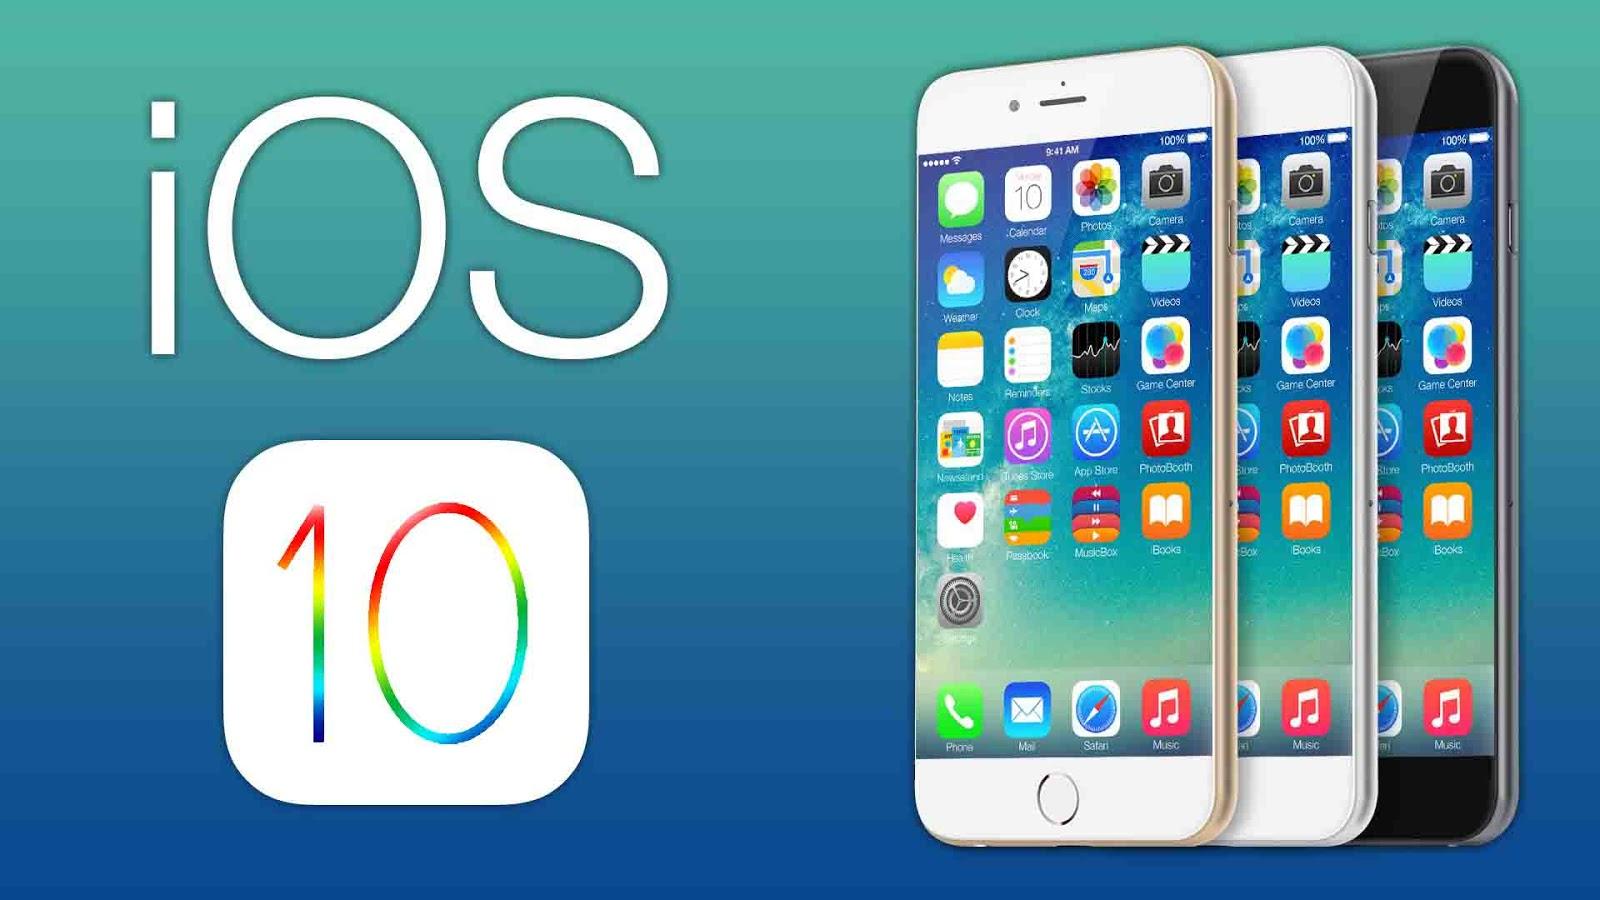 ios10: iOS 10 beta Download links - Beta, Pre-Release, Final